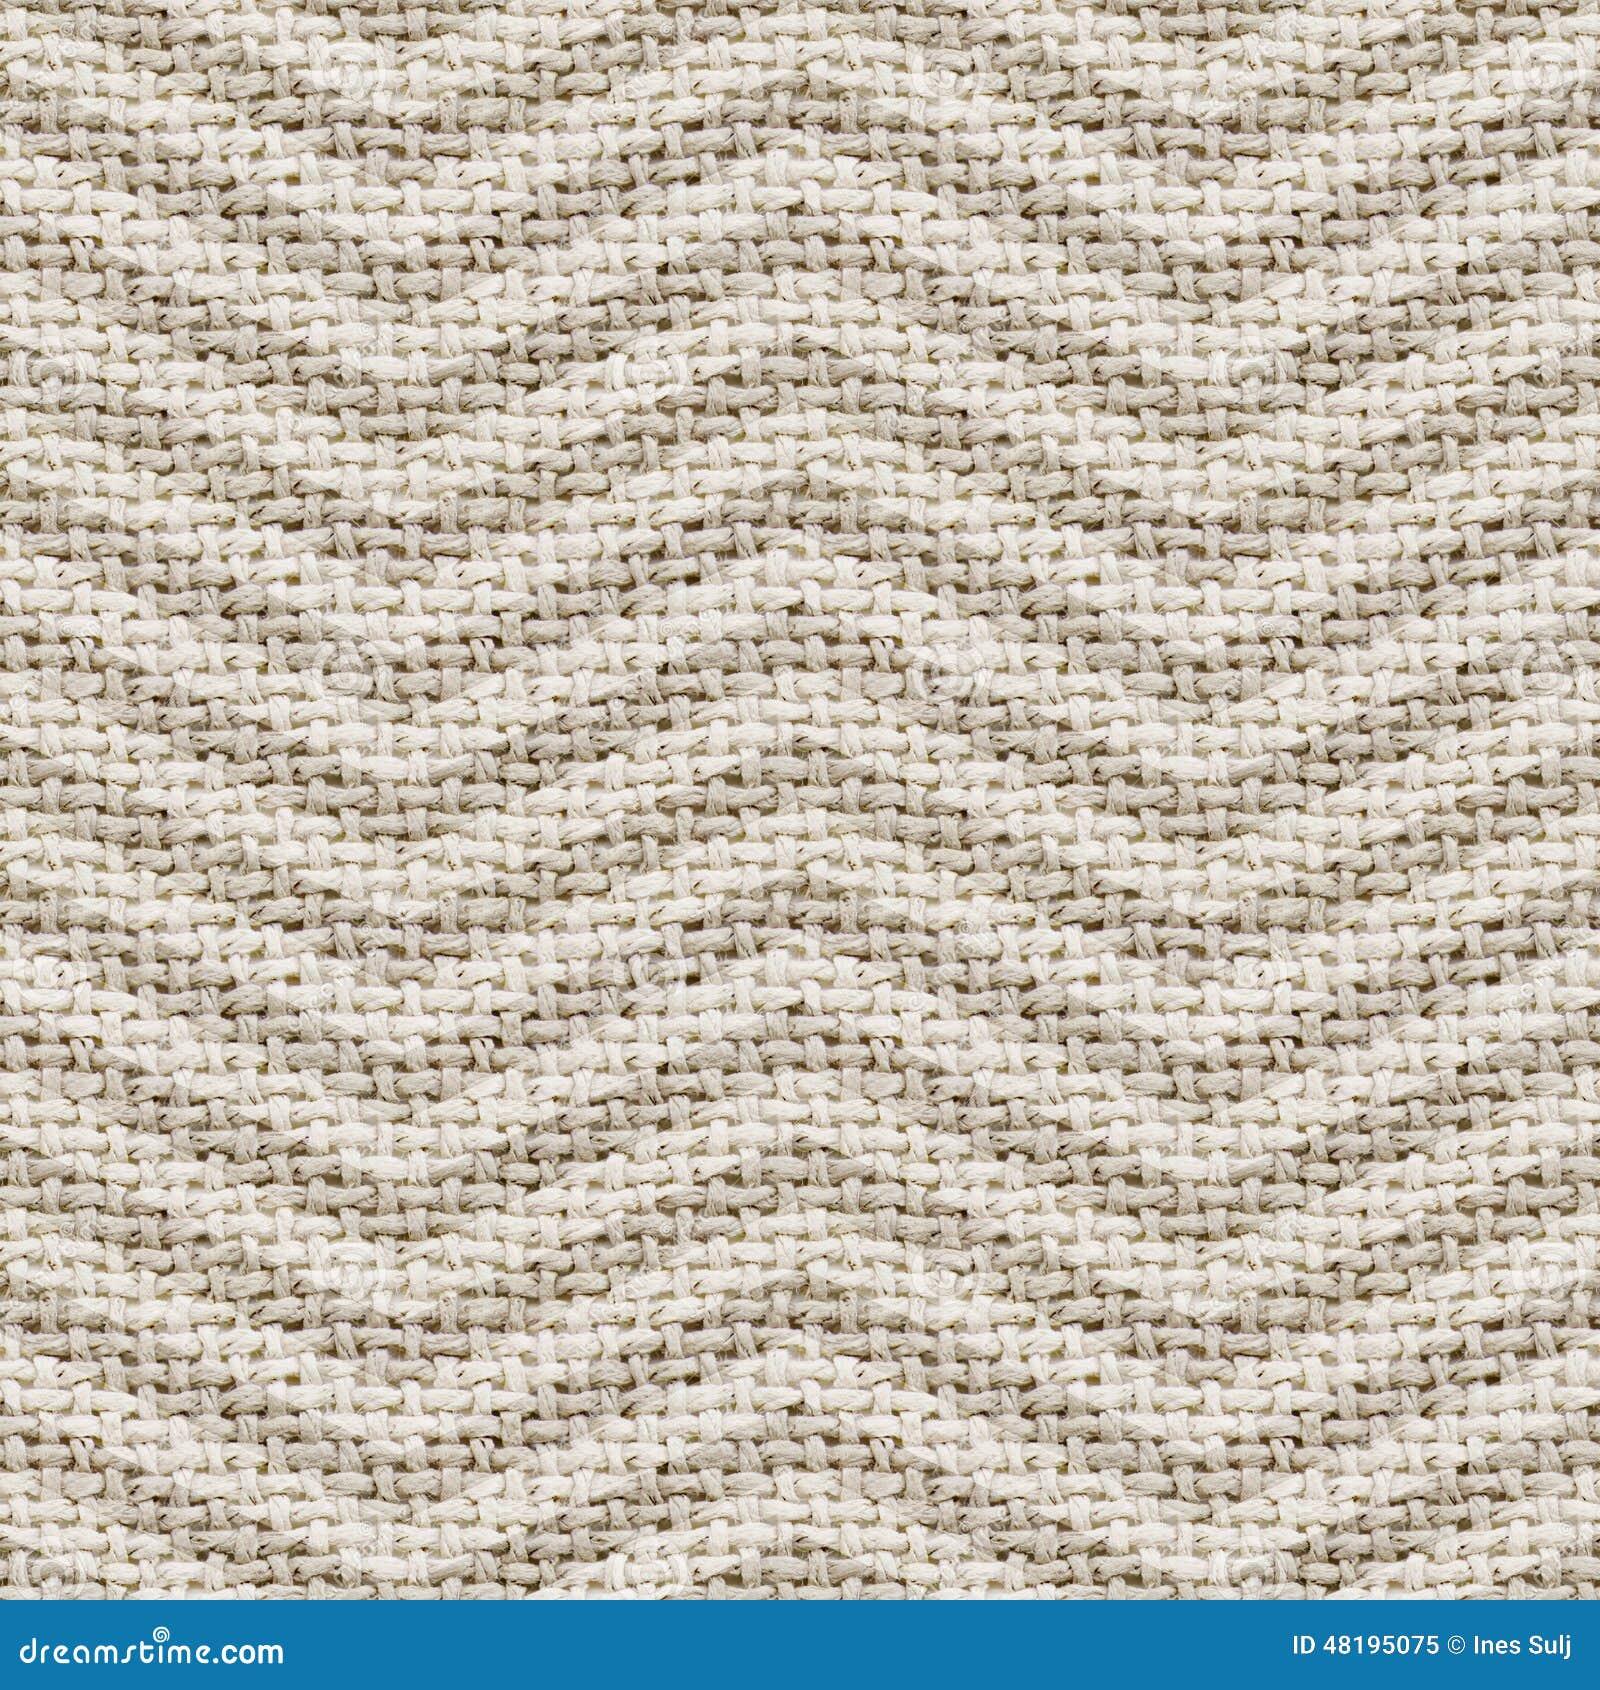 Burlap Texture Digital Paper Tileable Seamless Pattern